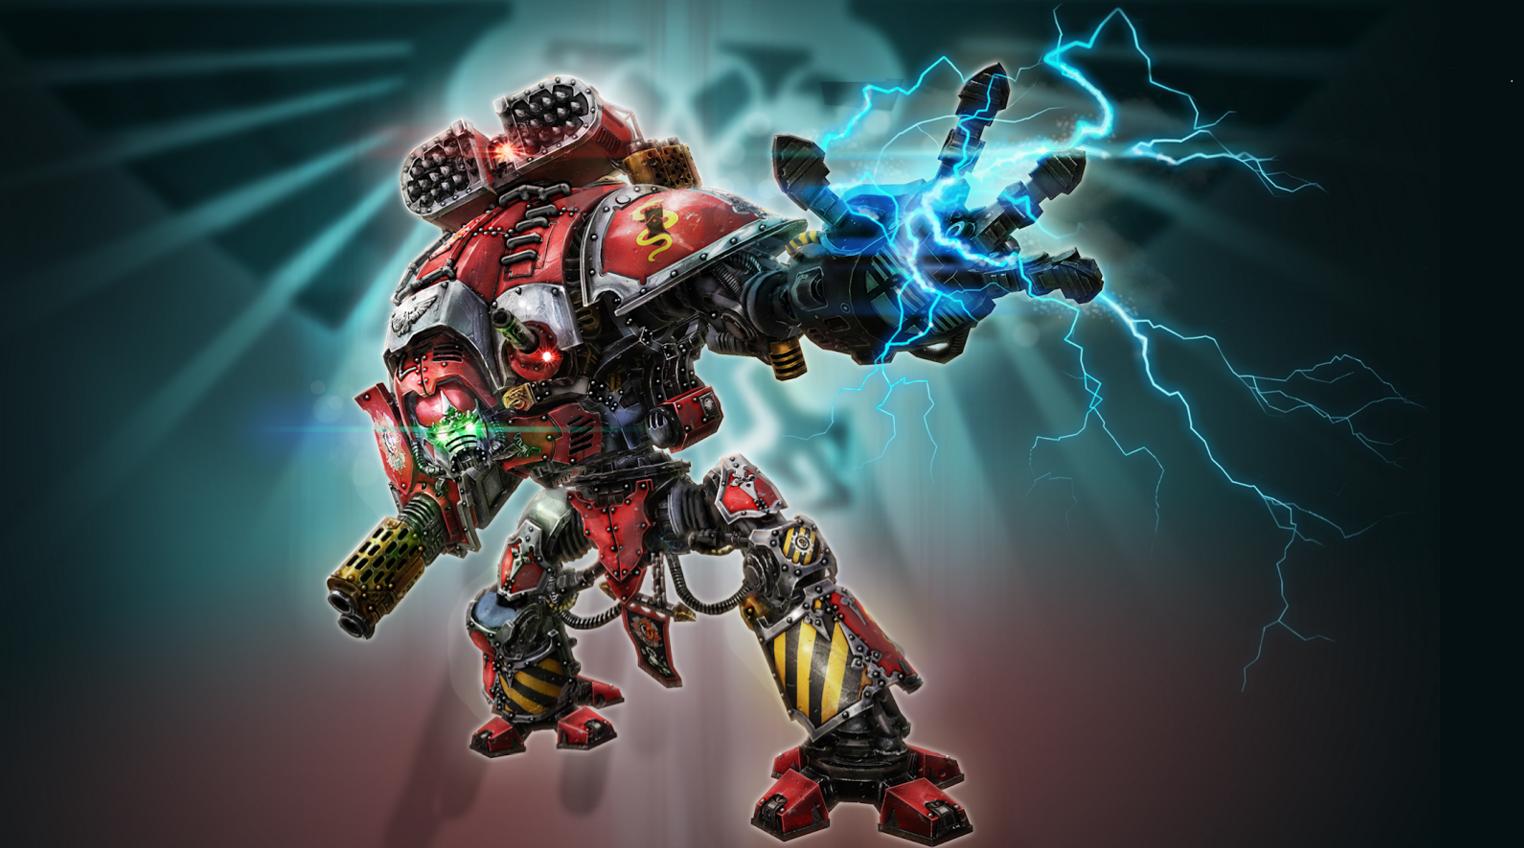 Warhammer_40k_40000_Freeblade_Play_Store_5